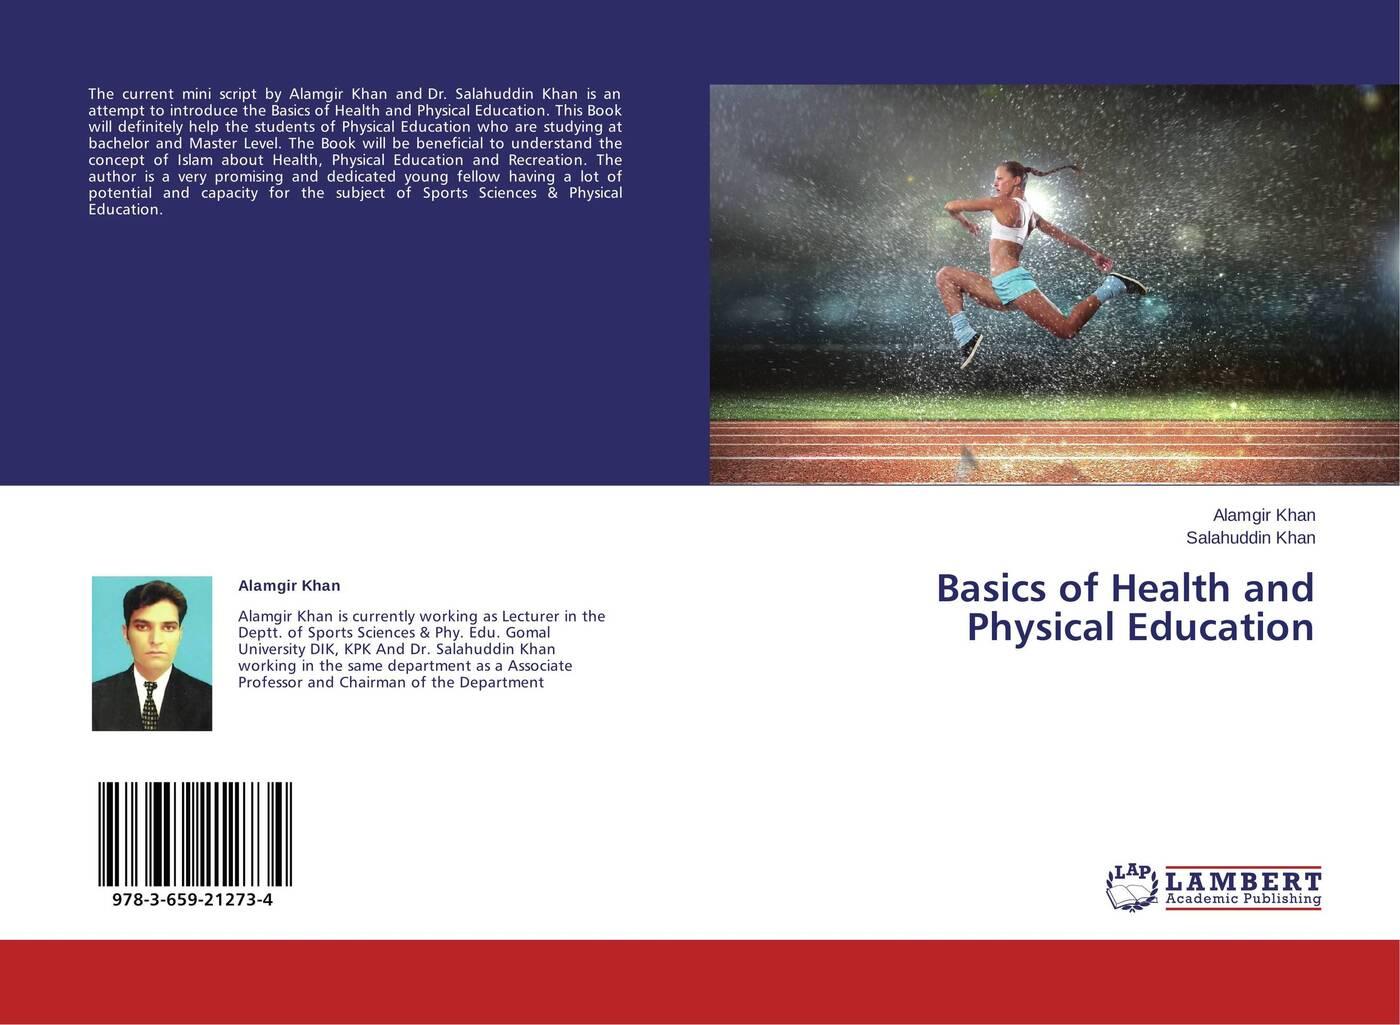 Alamgir Khan and Salahuddin Khan Basics of Health and Physical Education